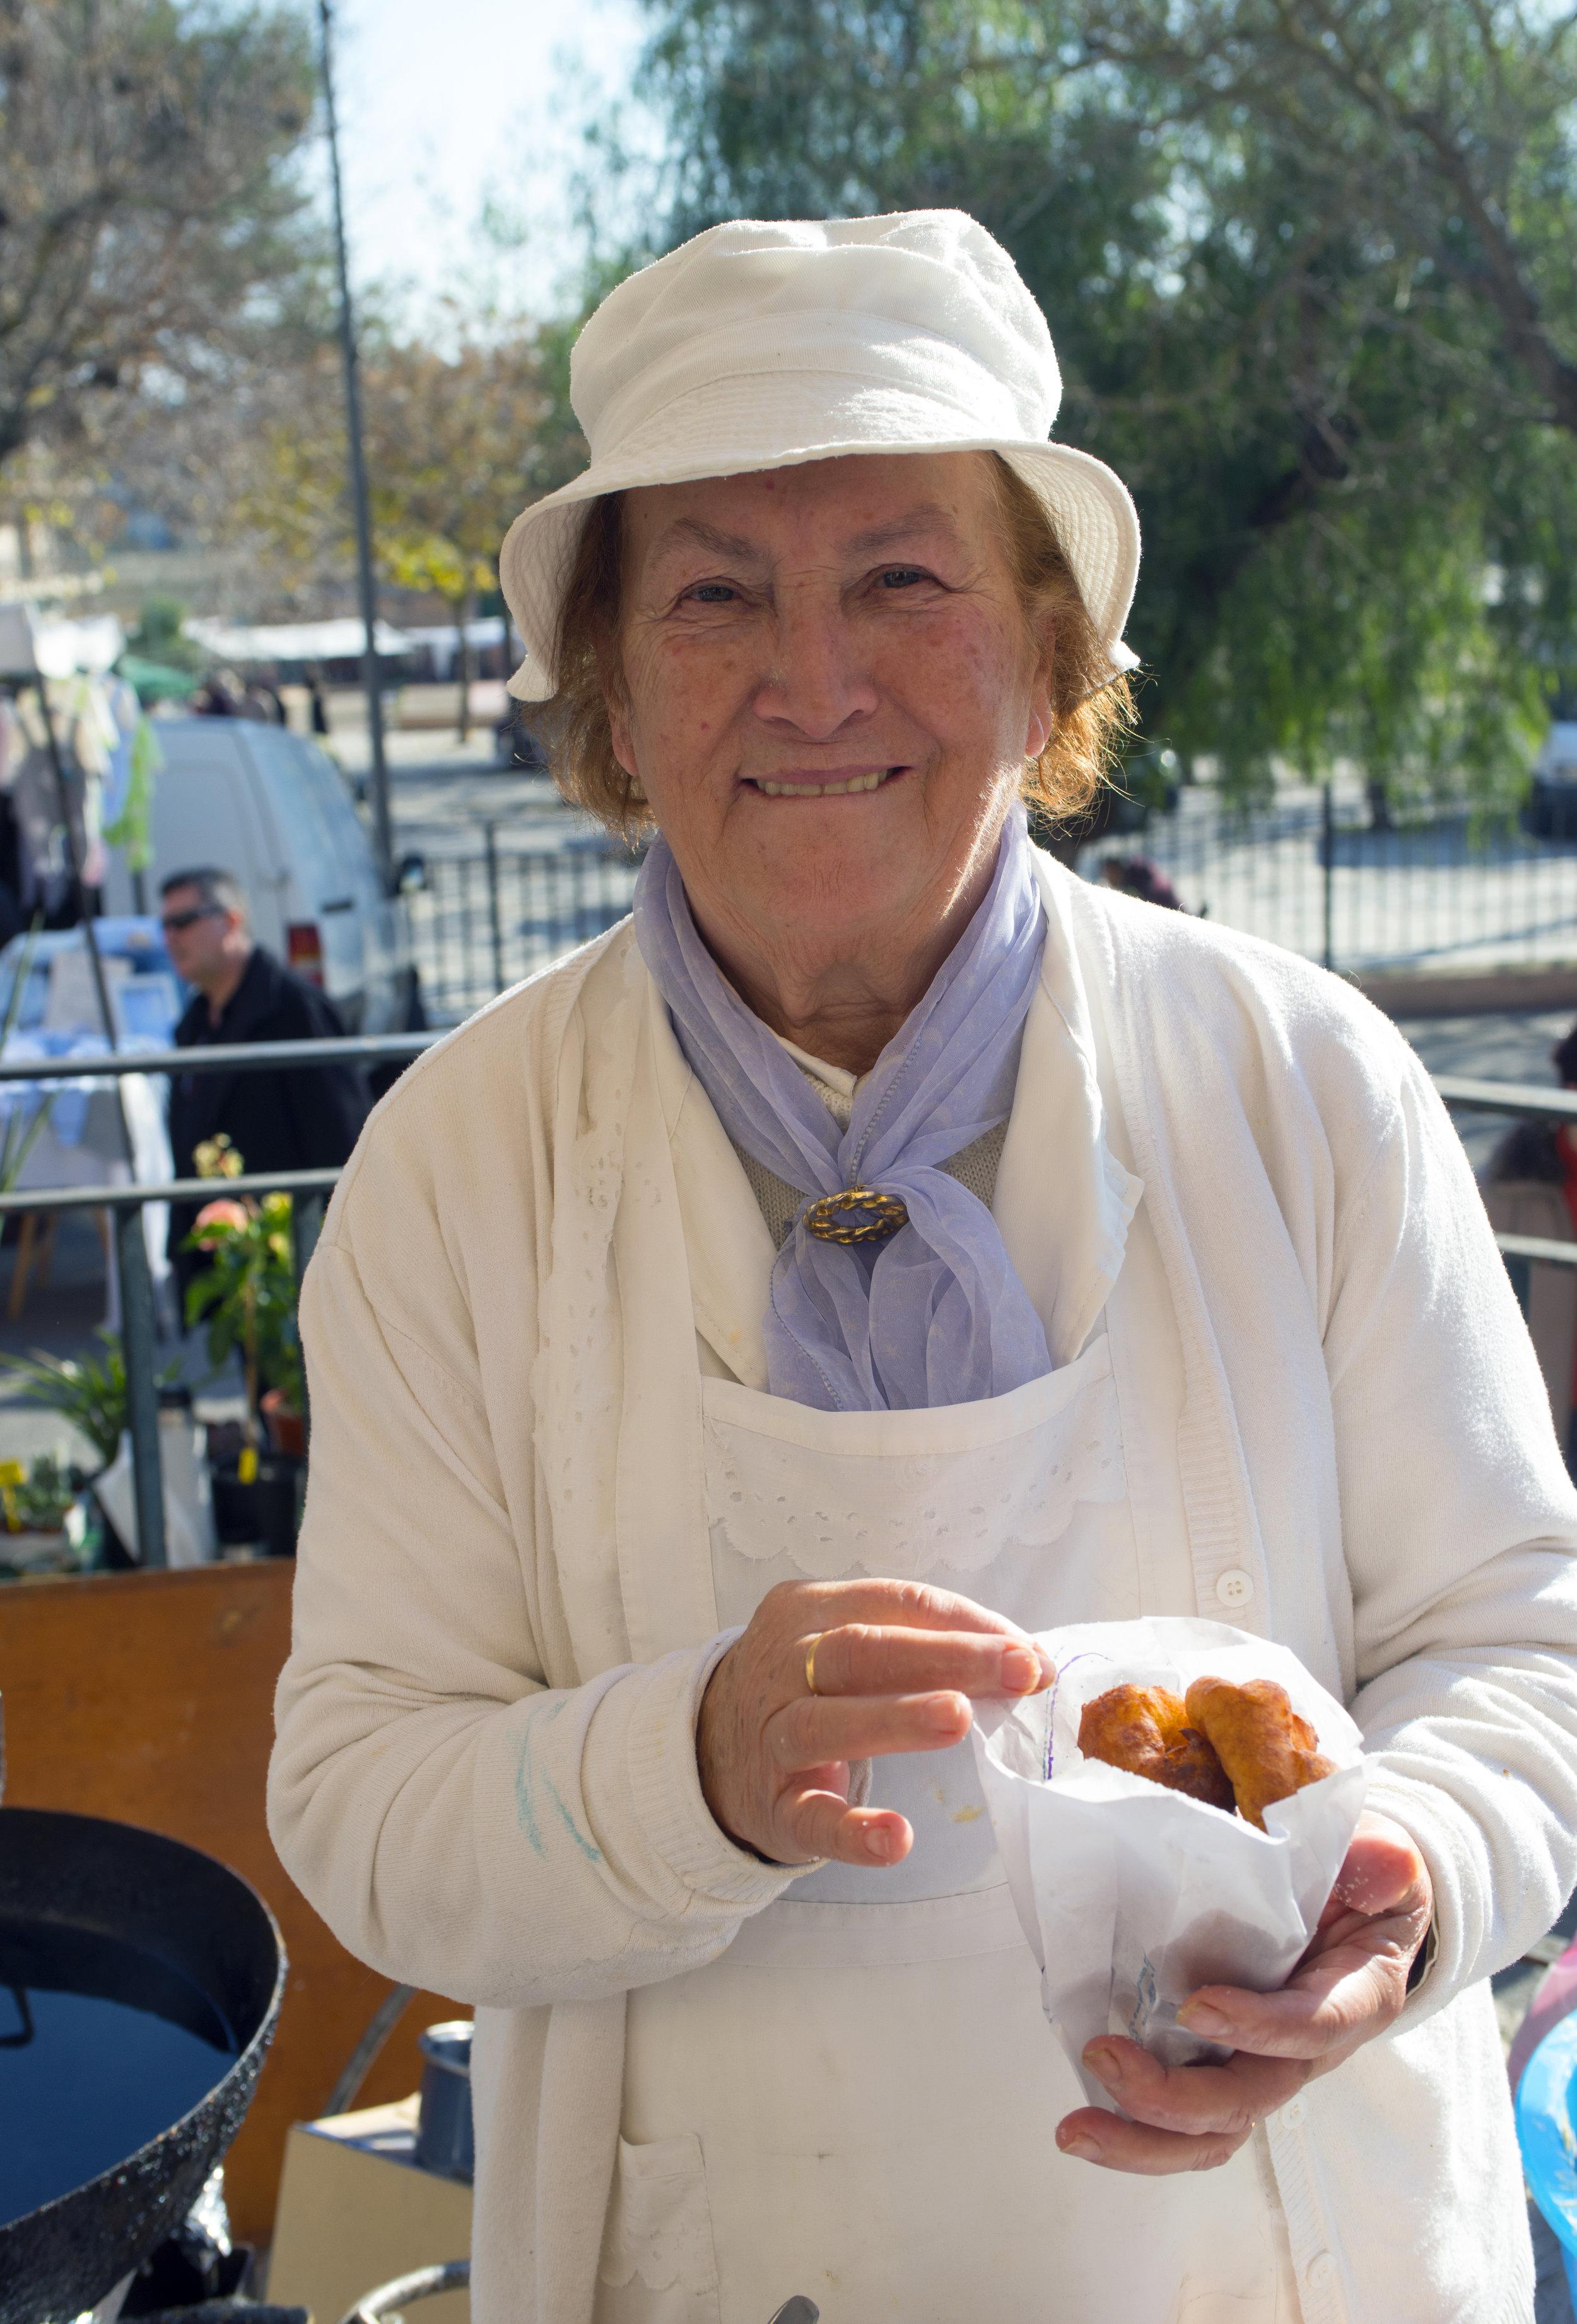 Warm donuts at the Sineu market, Mallorca Spain.